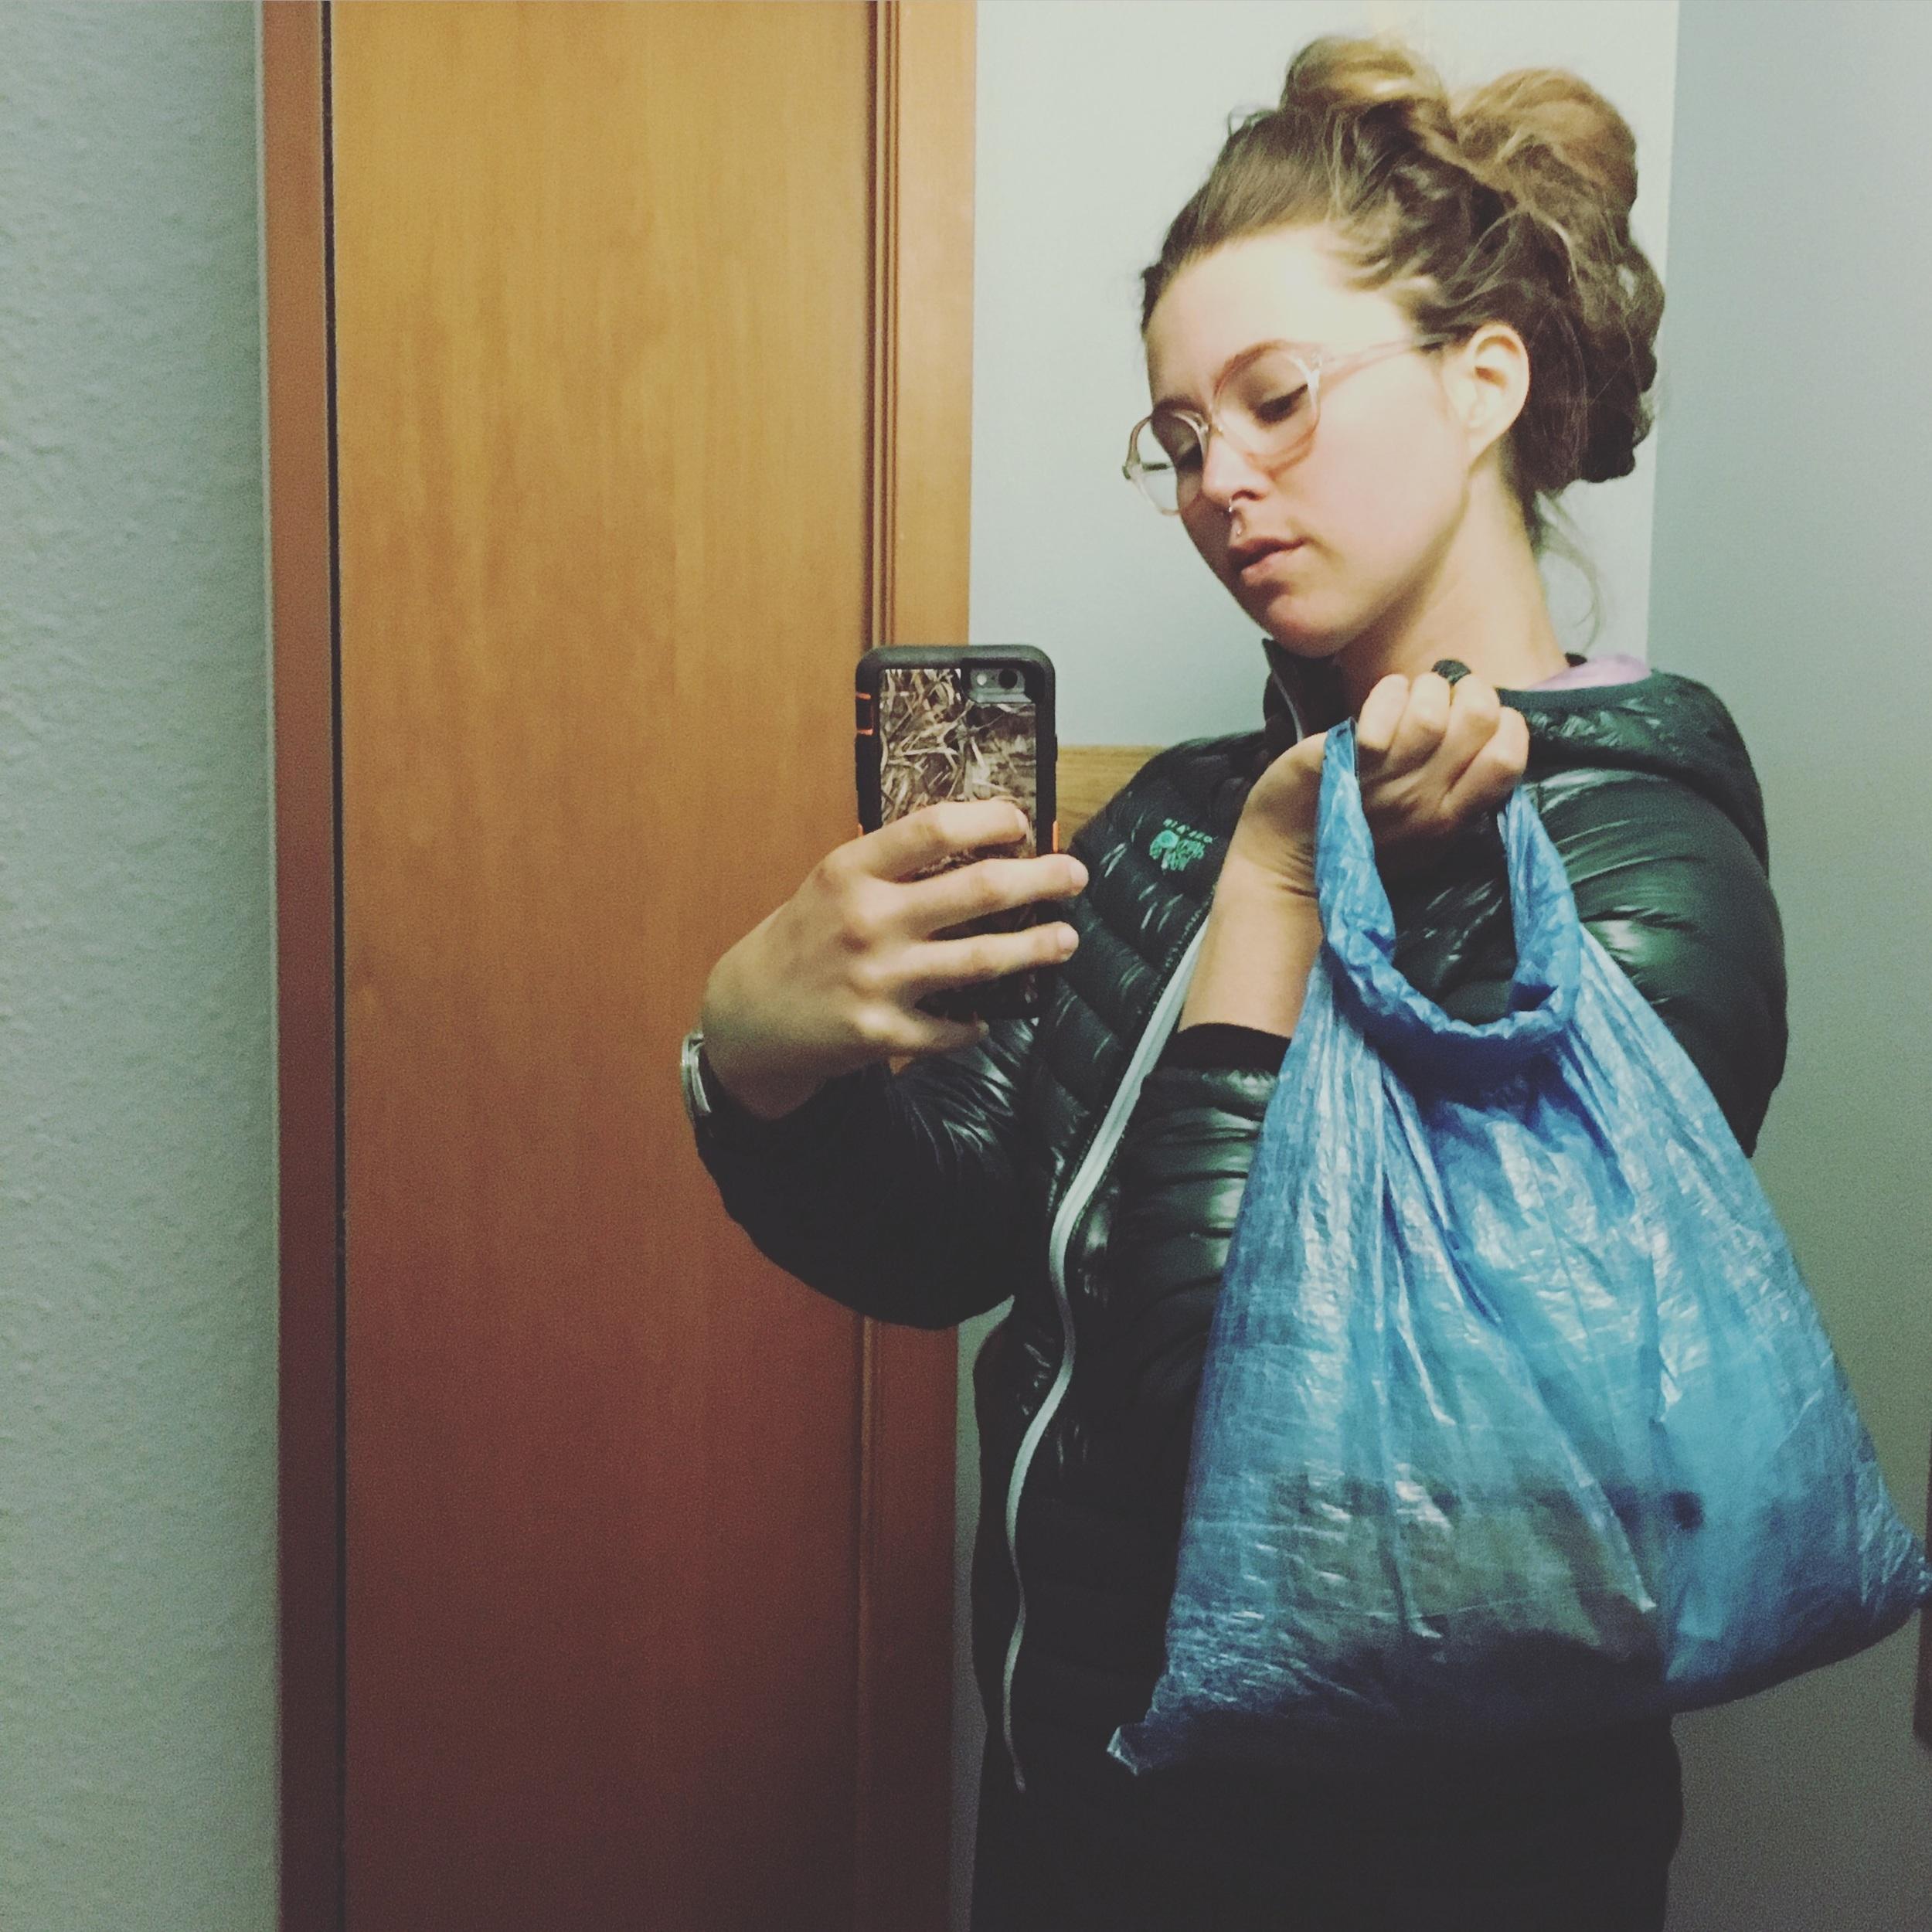 Fashionable cuben purse for town errands.